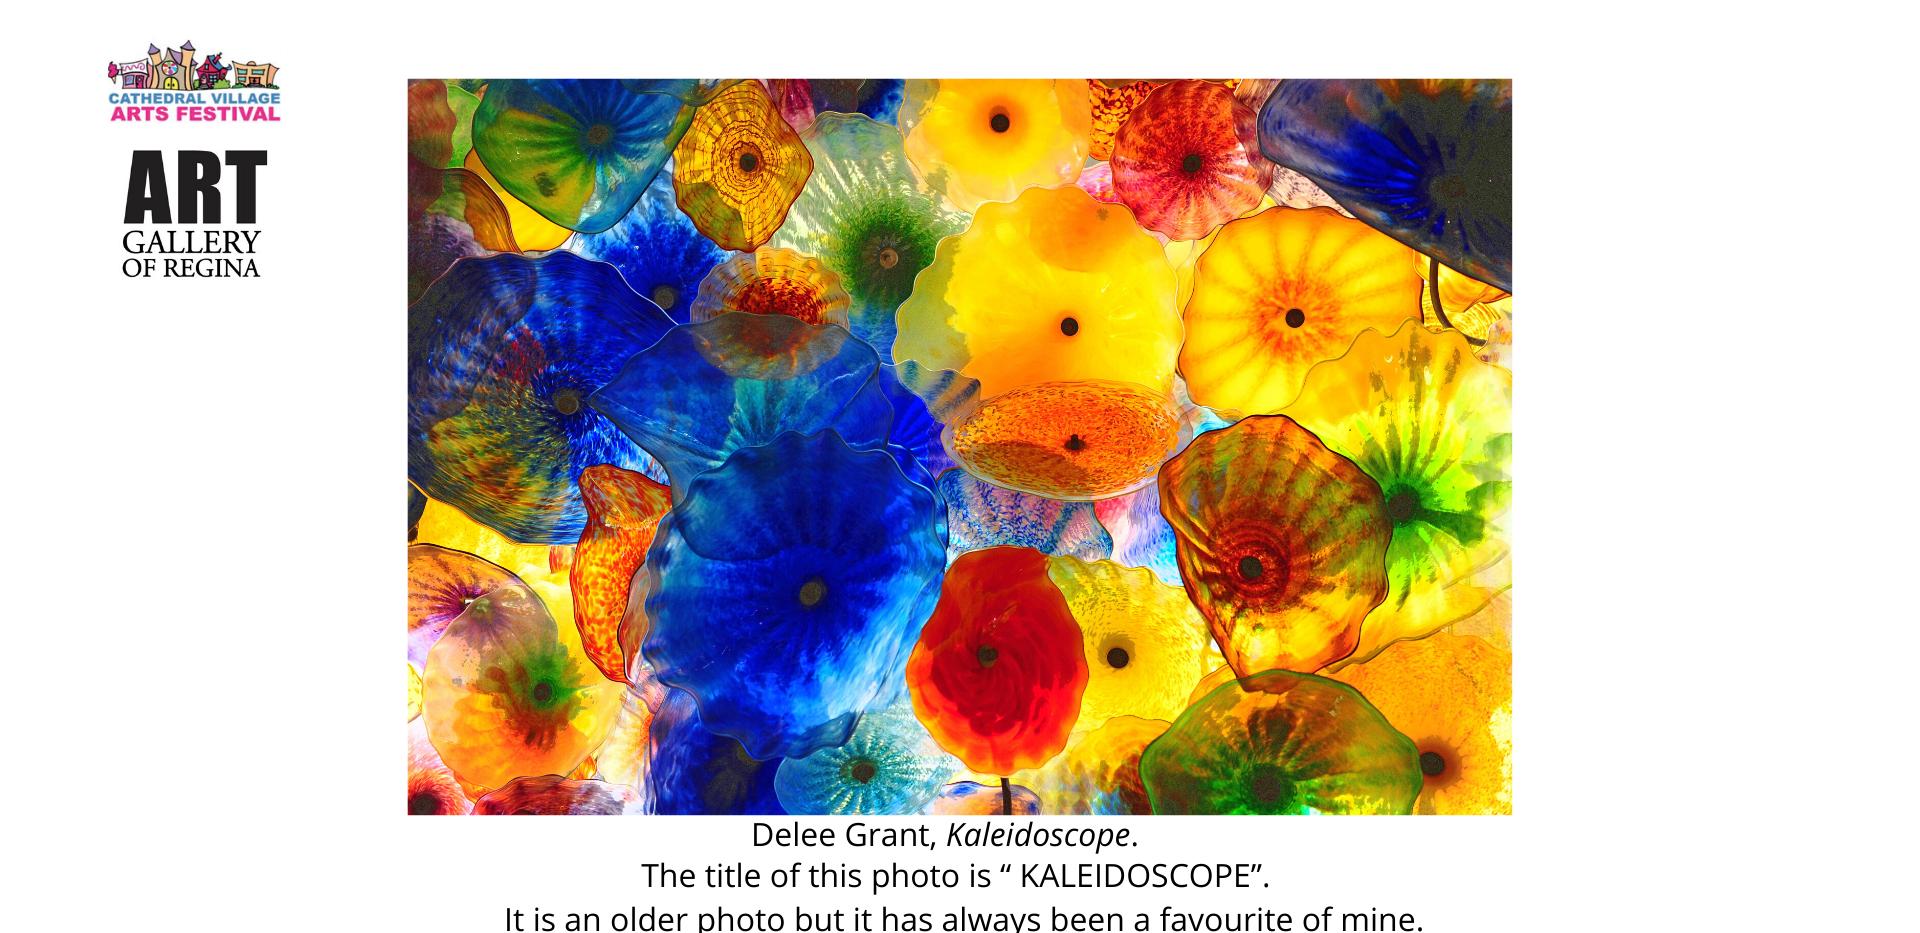 Delee Grant, Kaleidoscope.